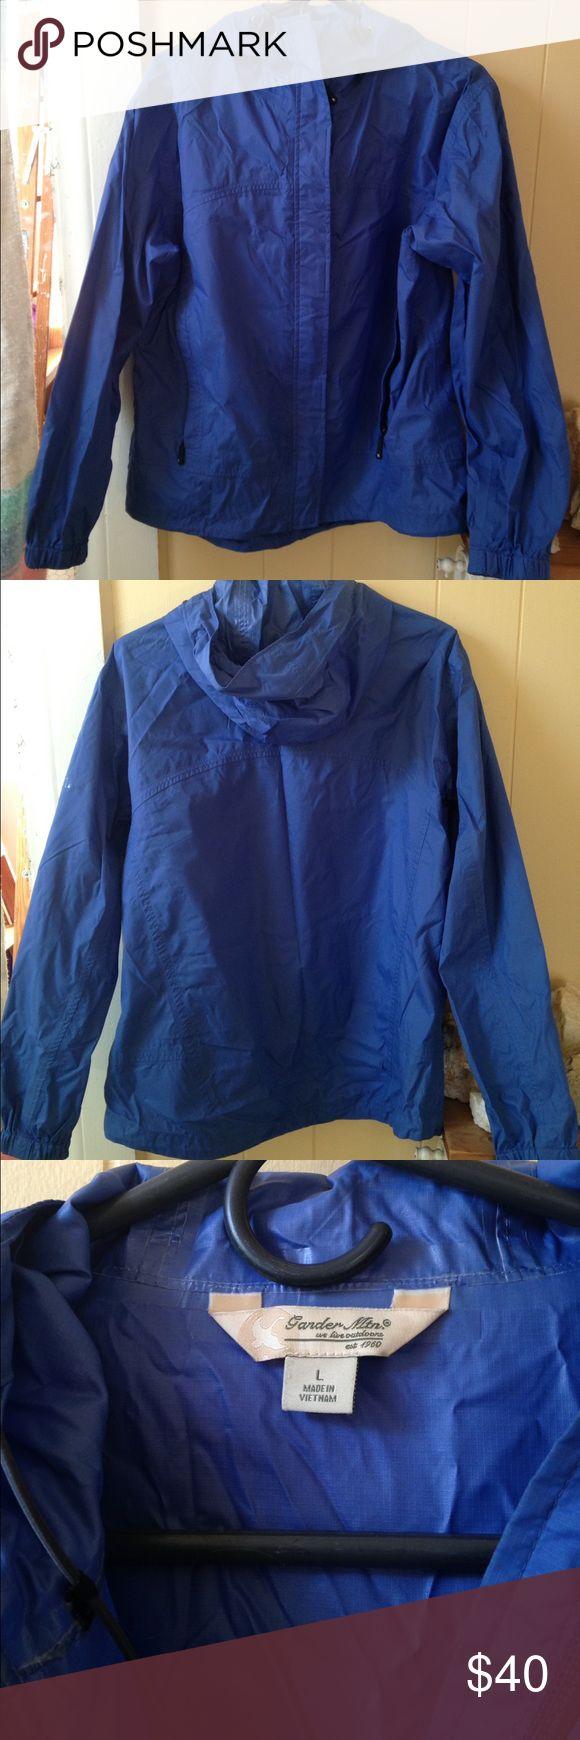 Gander Mountain rain jacket Gander Mountain rain jacket in great condition only worn a few times. Gander Mountain Jackets & Coats Utility Jackets